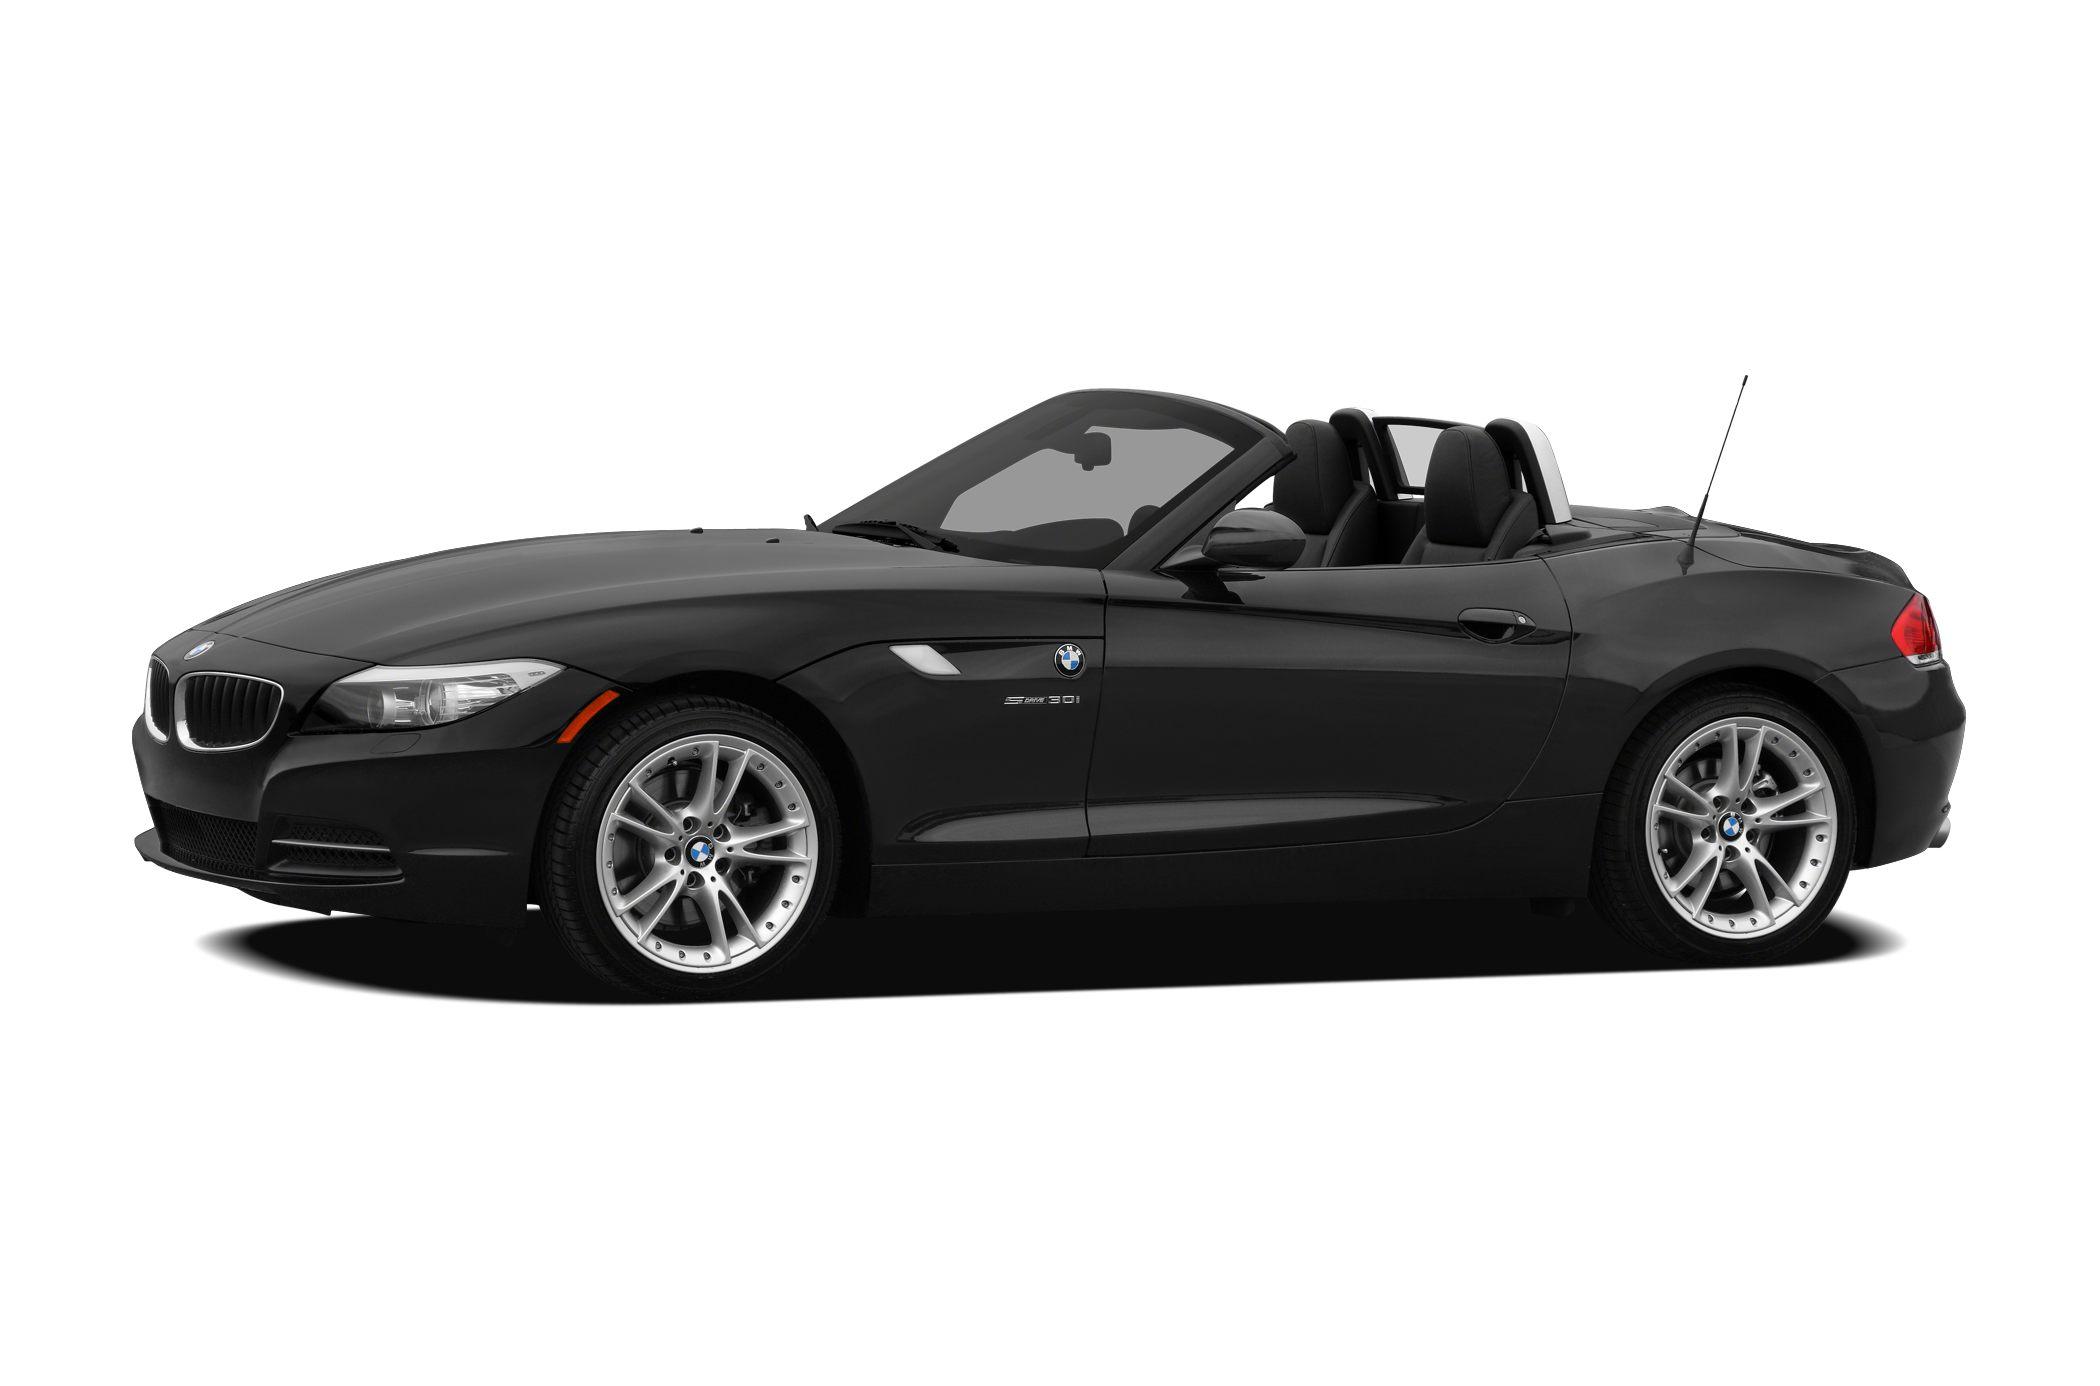 2012 BMW Z4 sDrive35is 2dr Rear wheel Drive Roadster for Sale